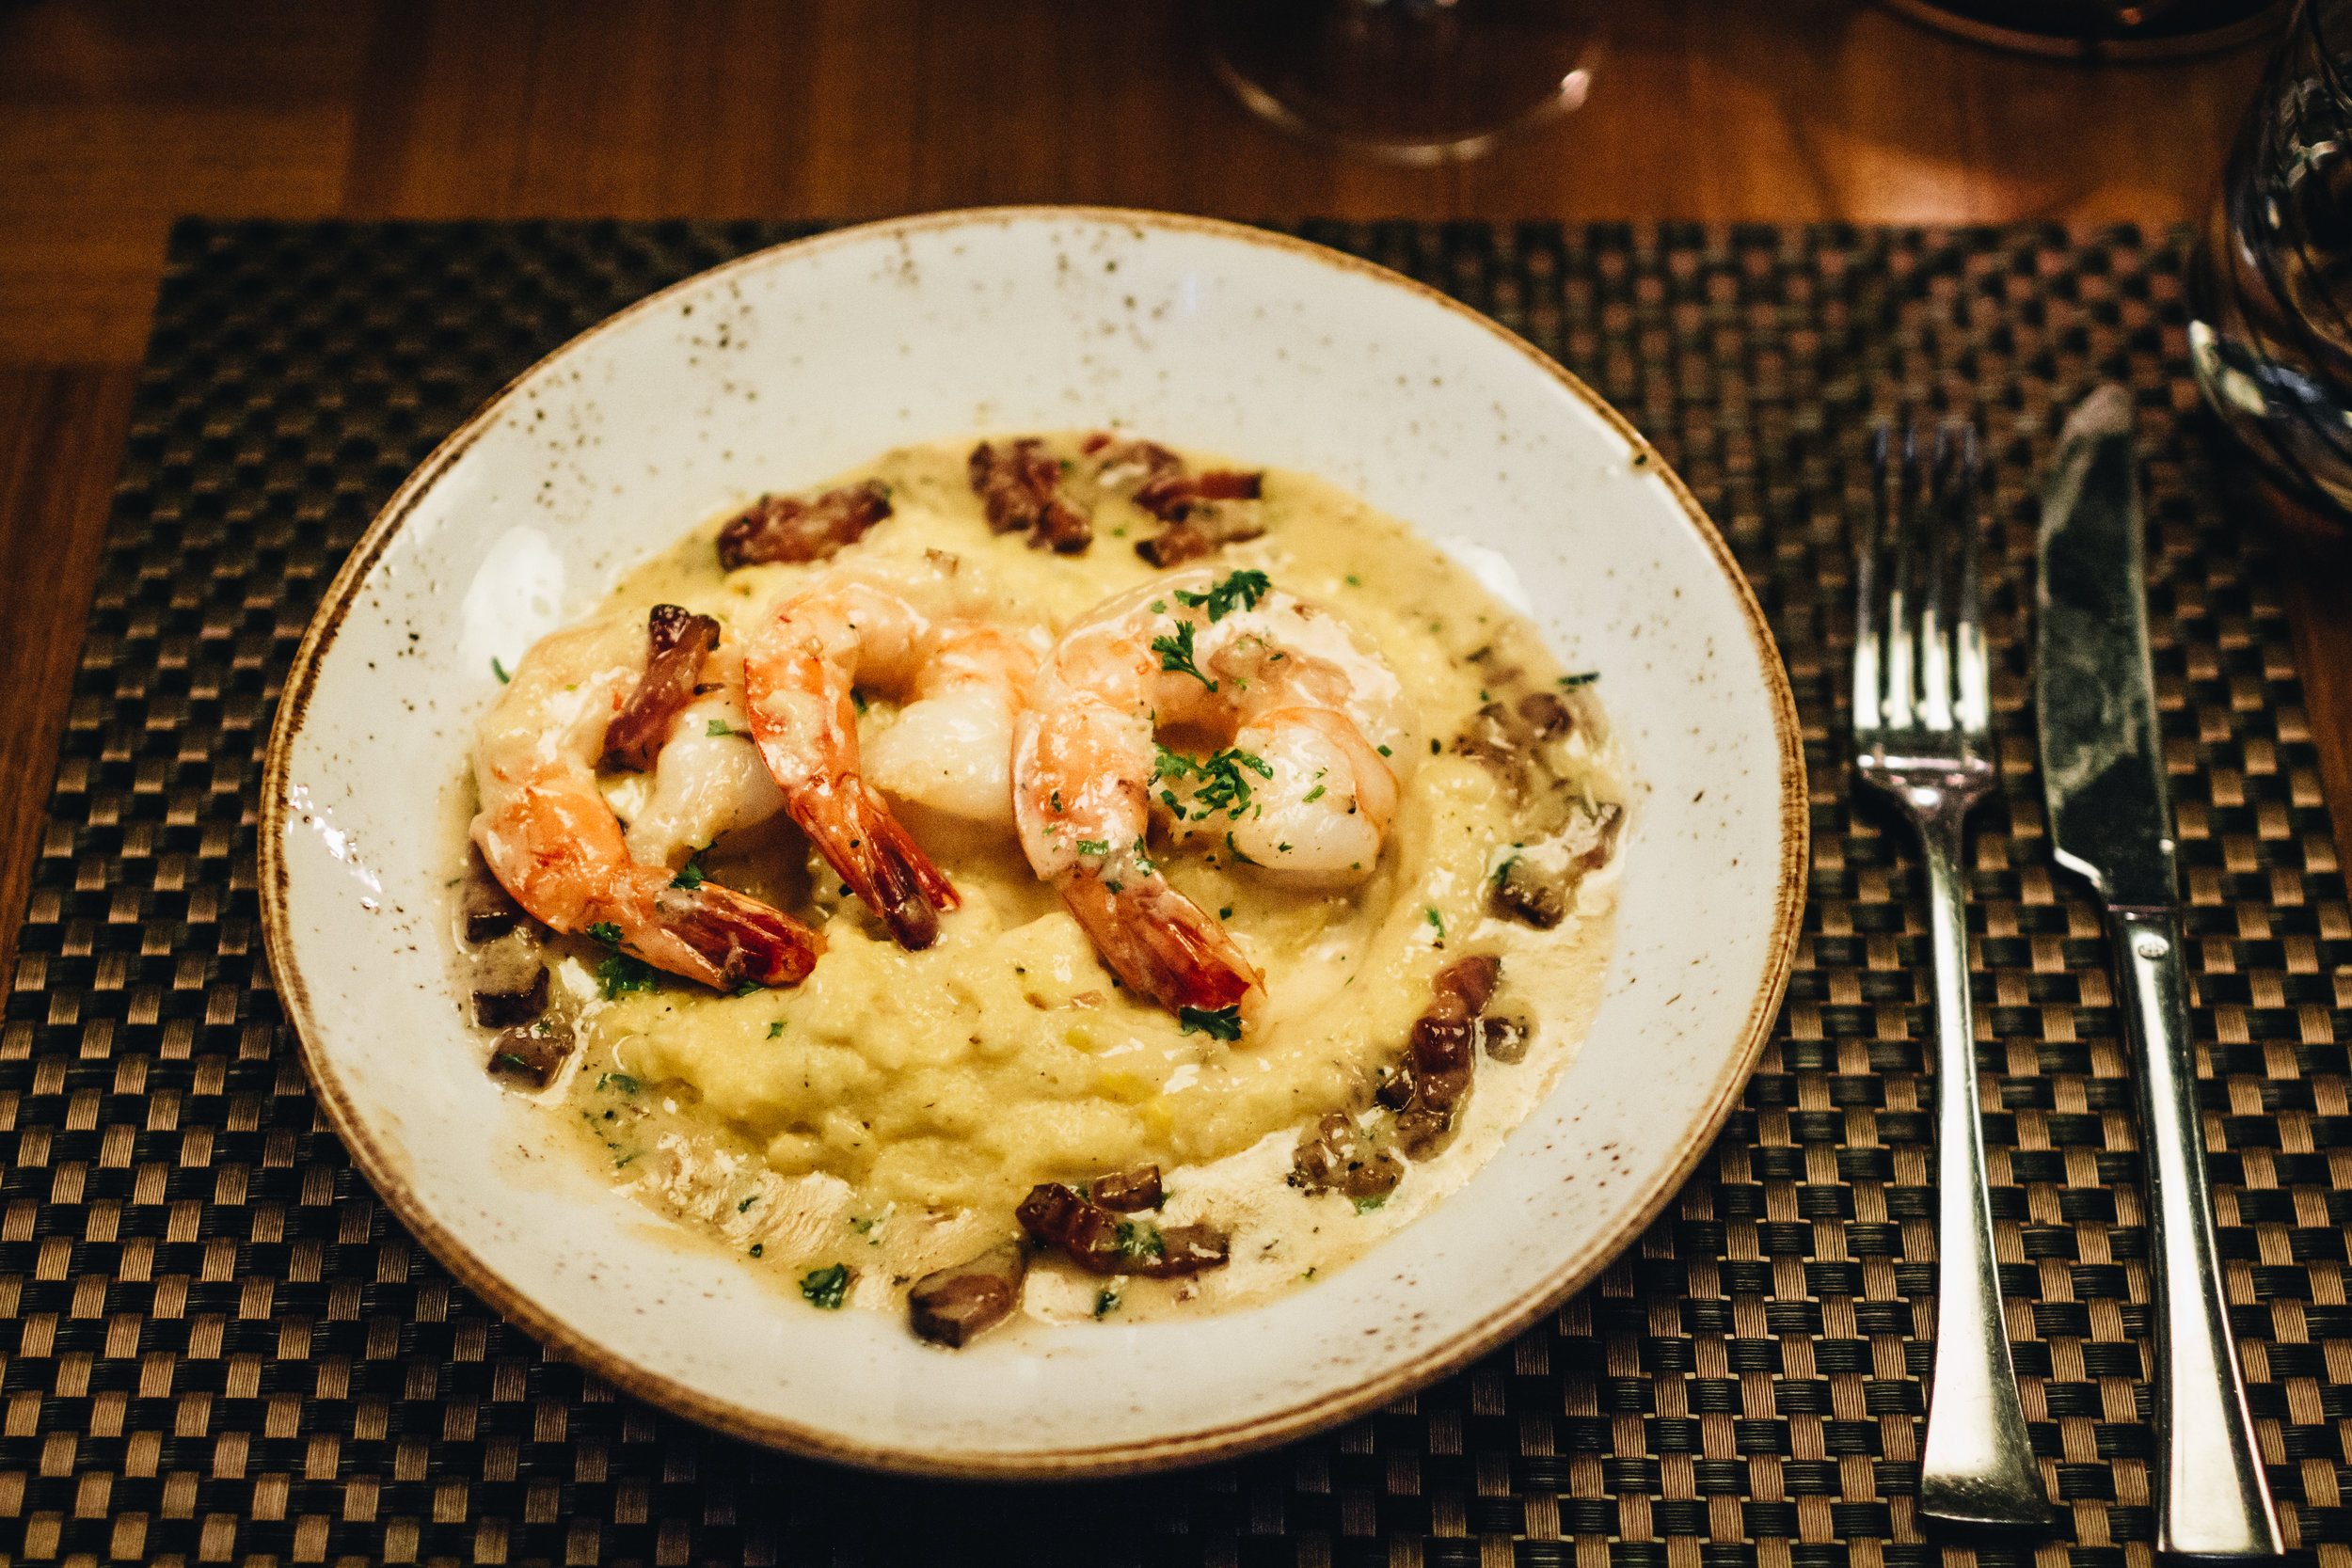 LAW Restaurant at Four Seasons Dallas